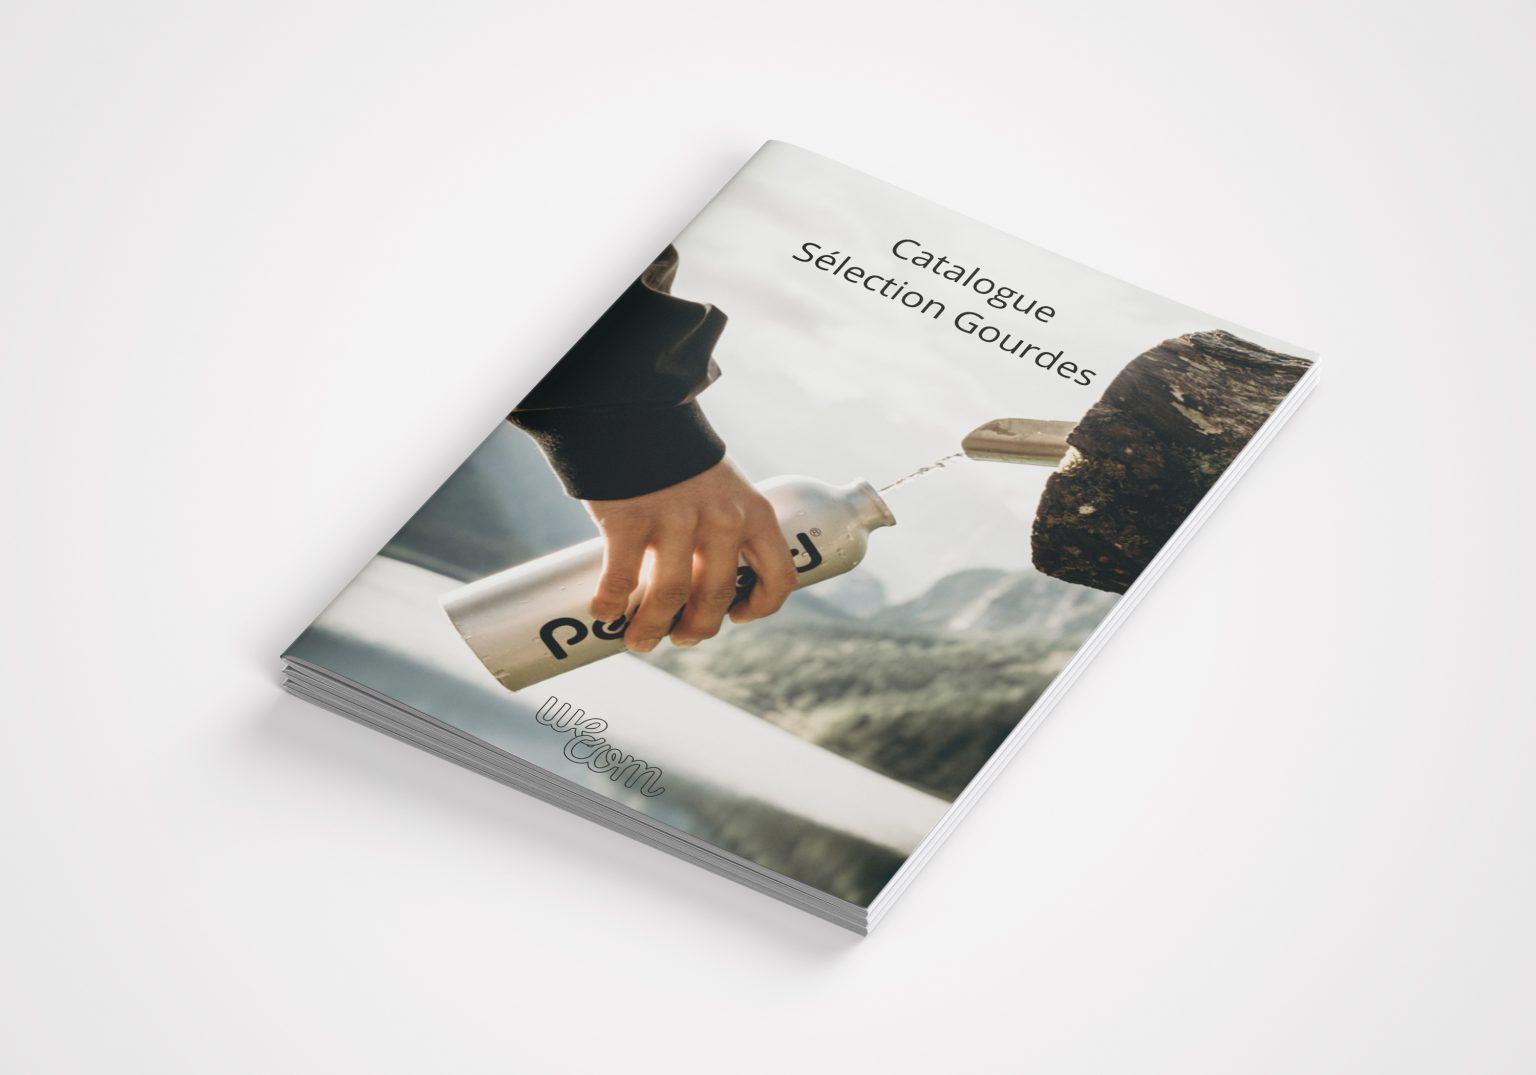 MKP-couverture-catalogue-selection-gourde-1536x1075